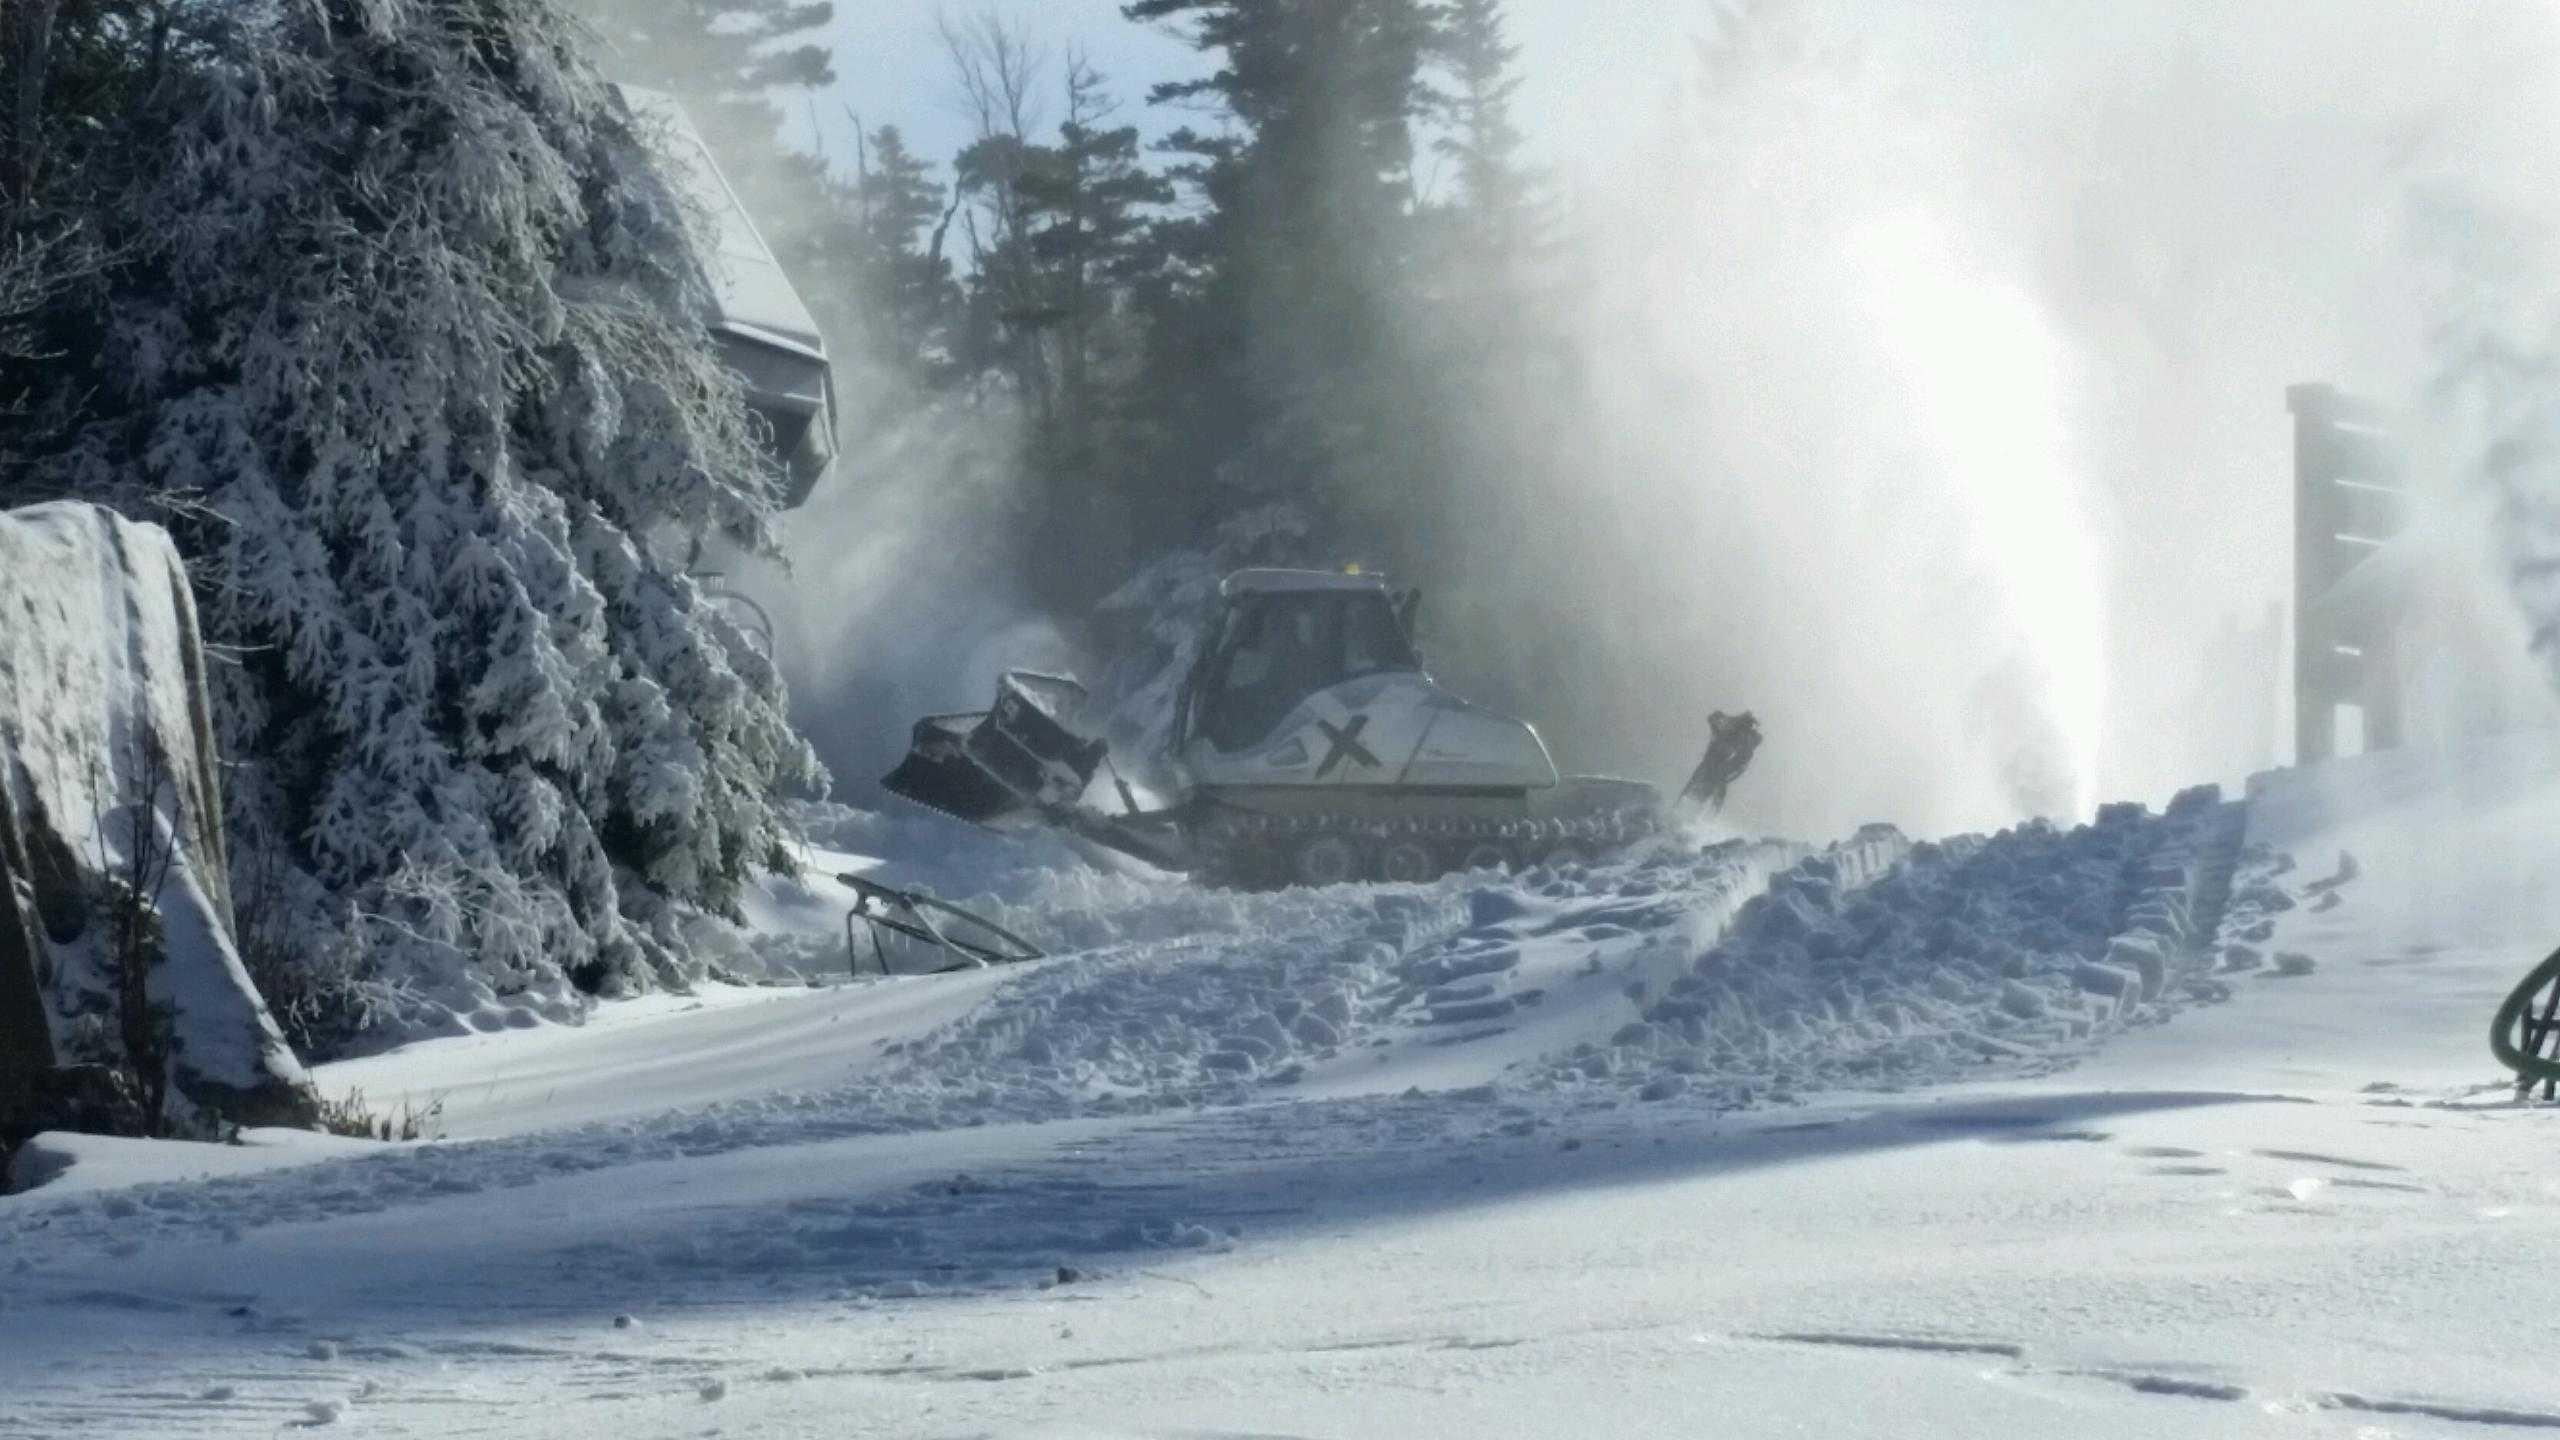 Bretton woods opens